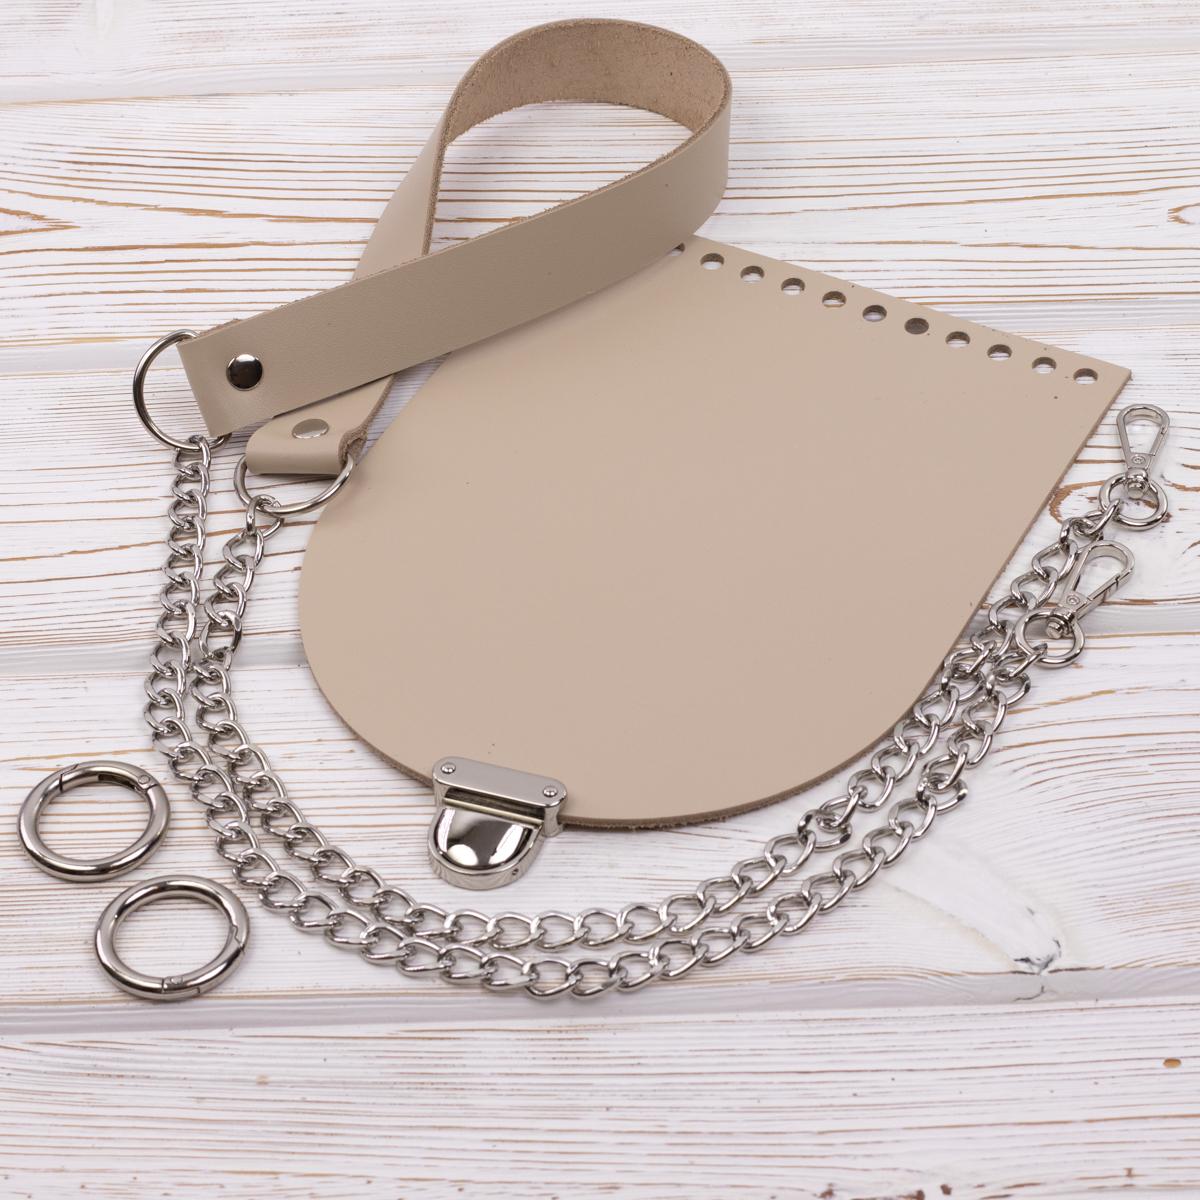 "Каталог Комплект для сумочки Орео ""Кремовый"" N2 IMG_7025.jpg"